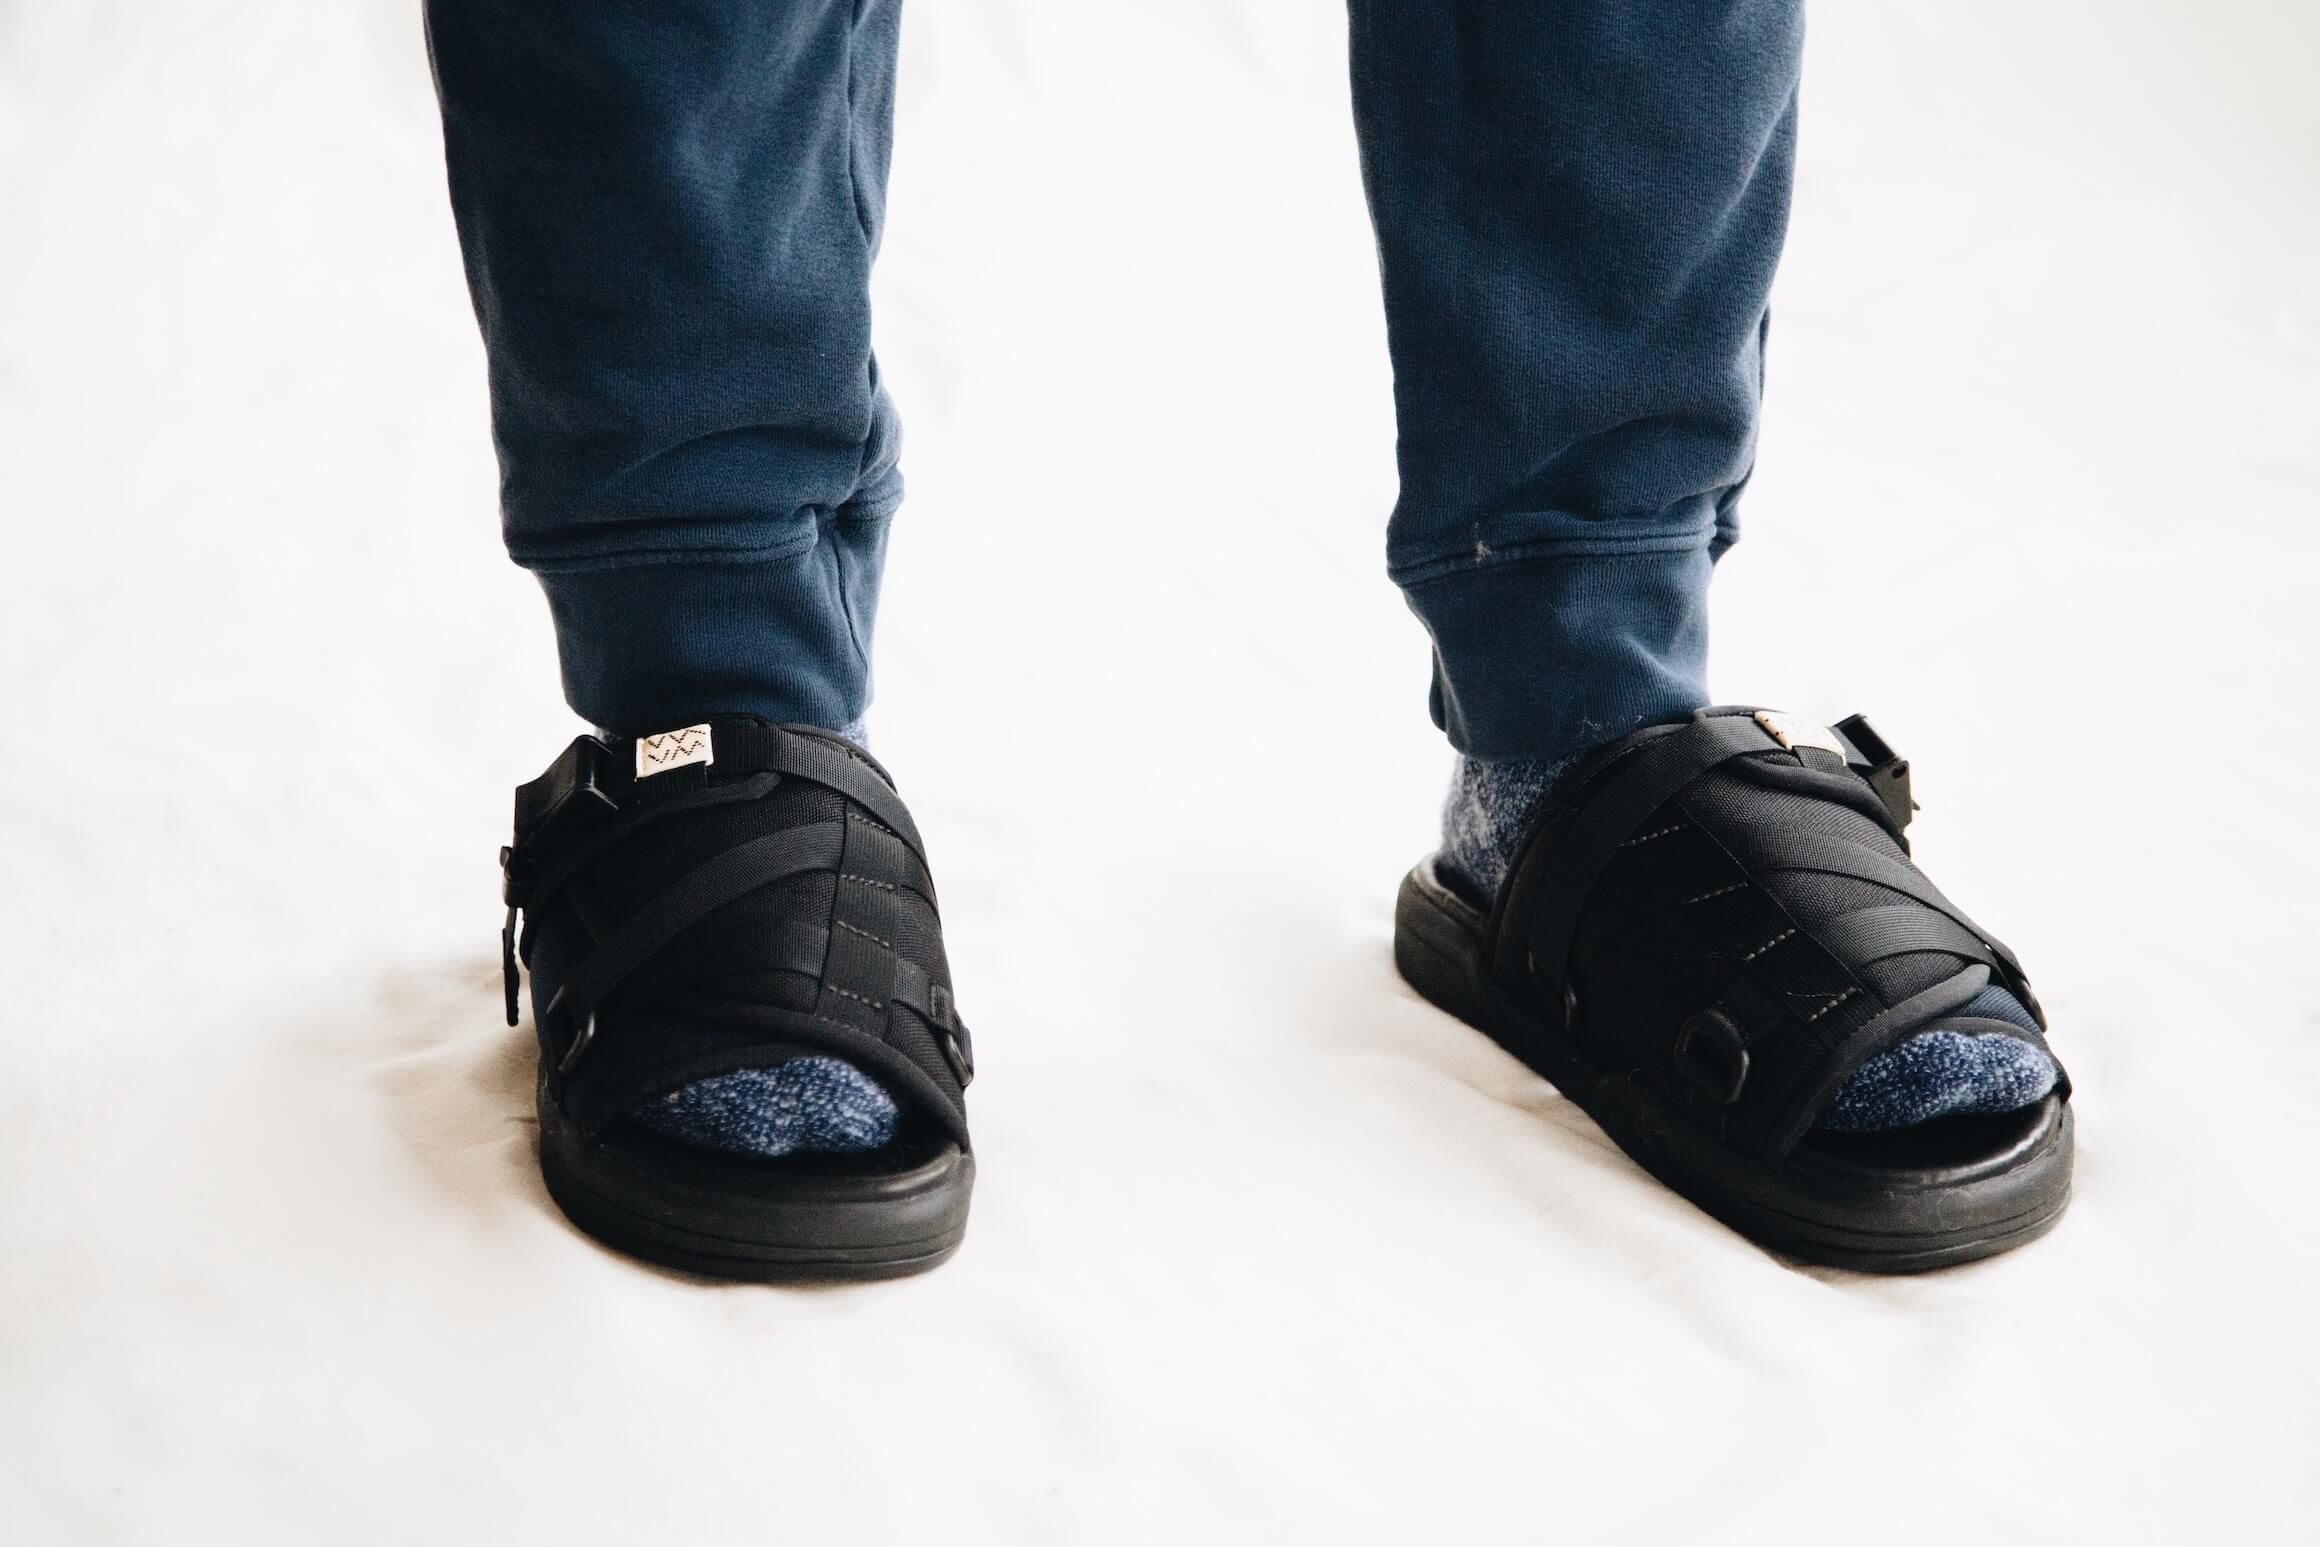 visvim christo 2-tone sandals on body